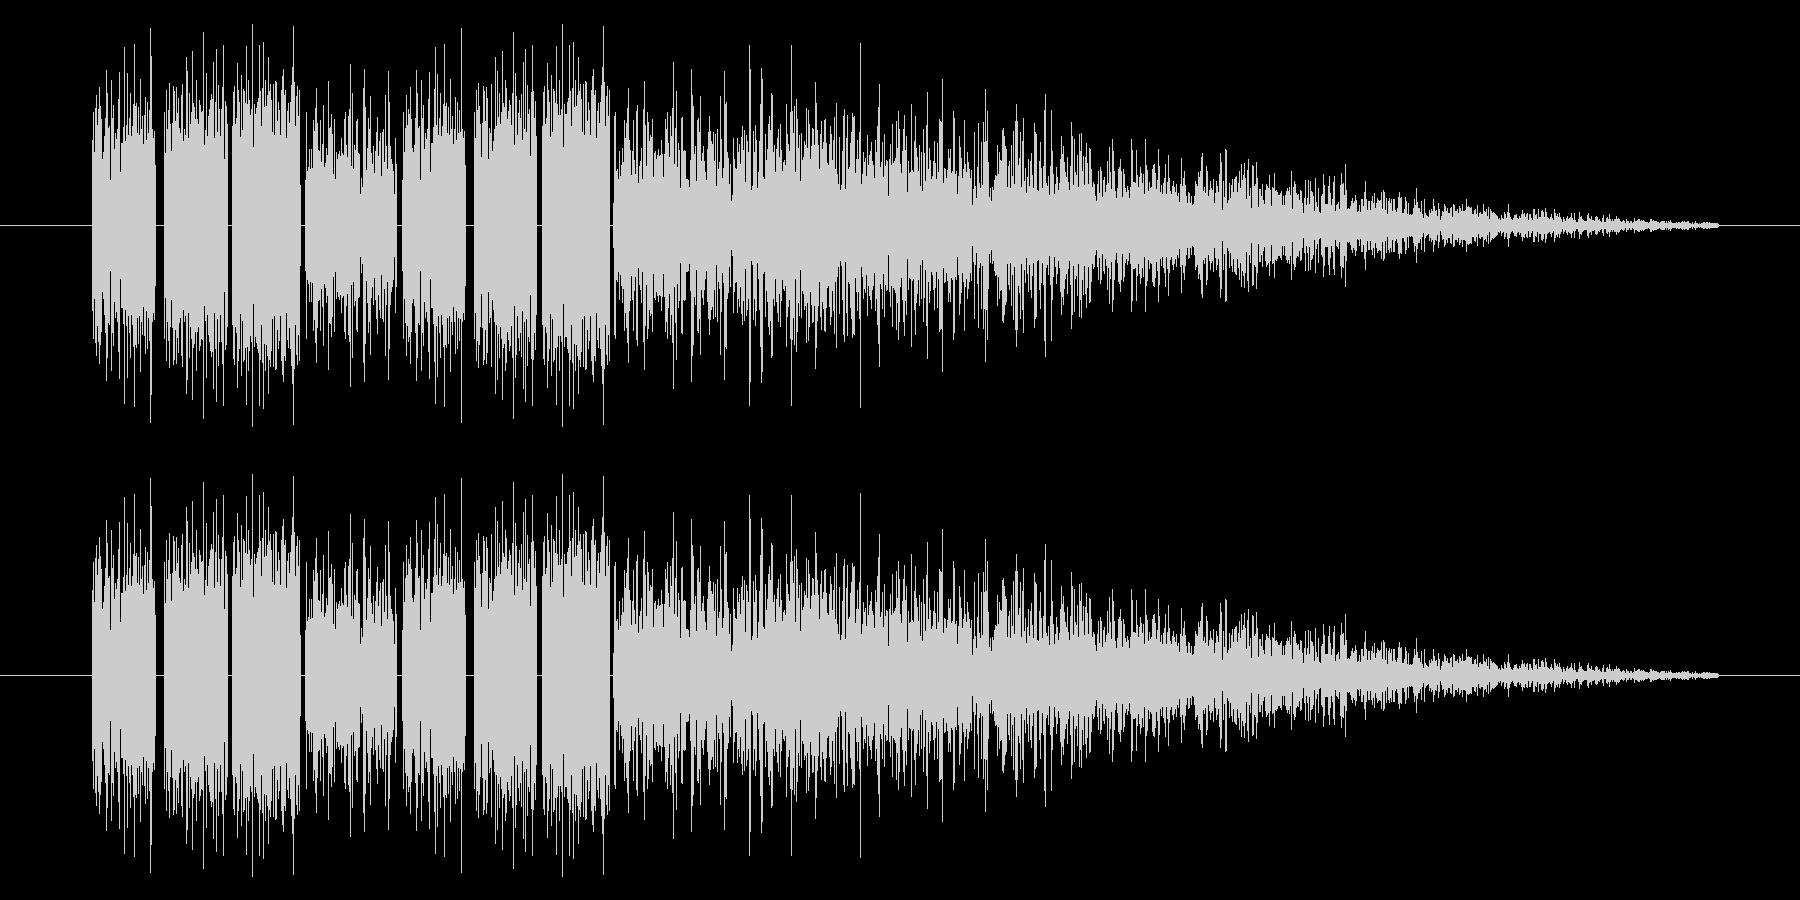 SNES-RPG04-07(魔法 雷3)の未再生の波形